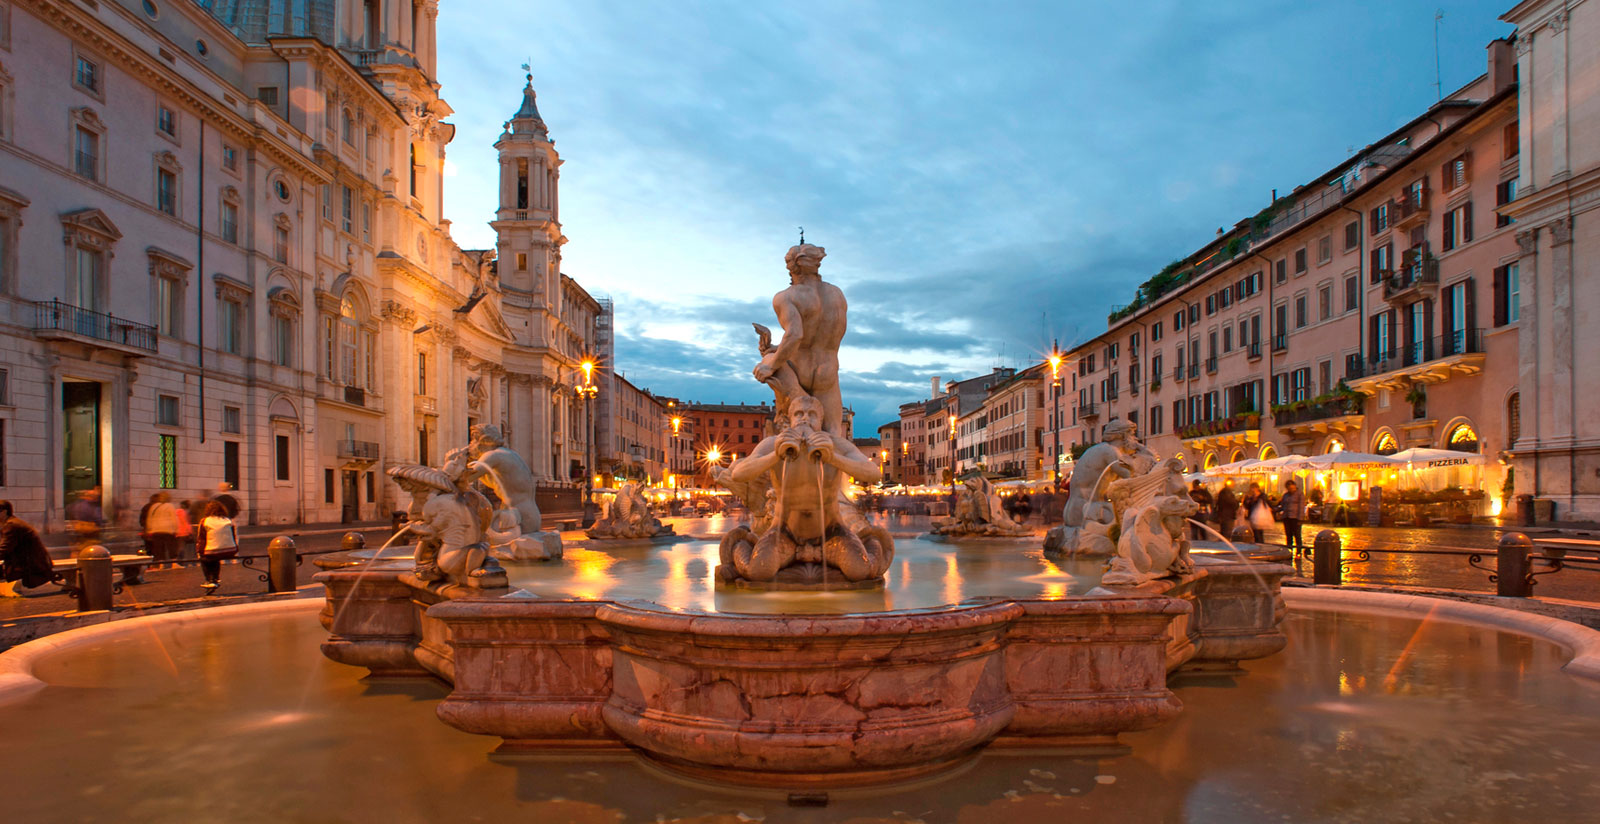 Holiday Apartments Rome City Centre